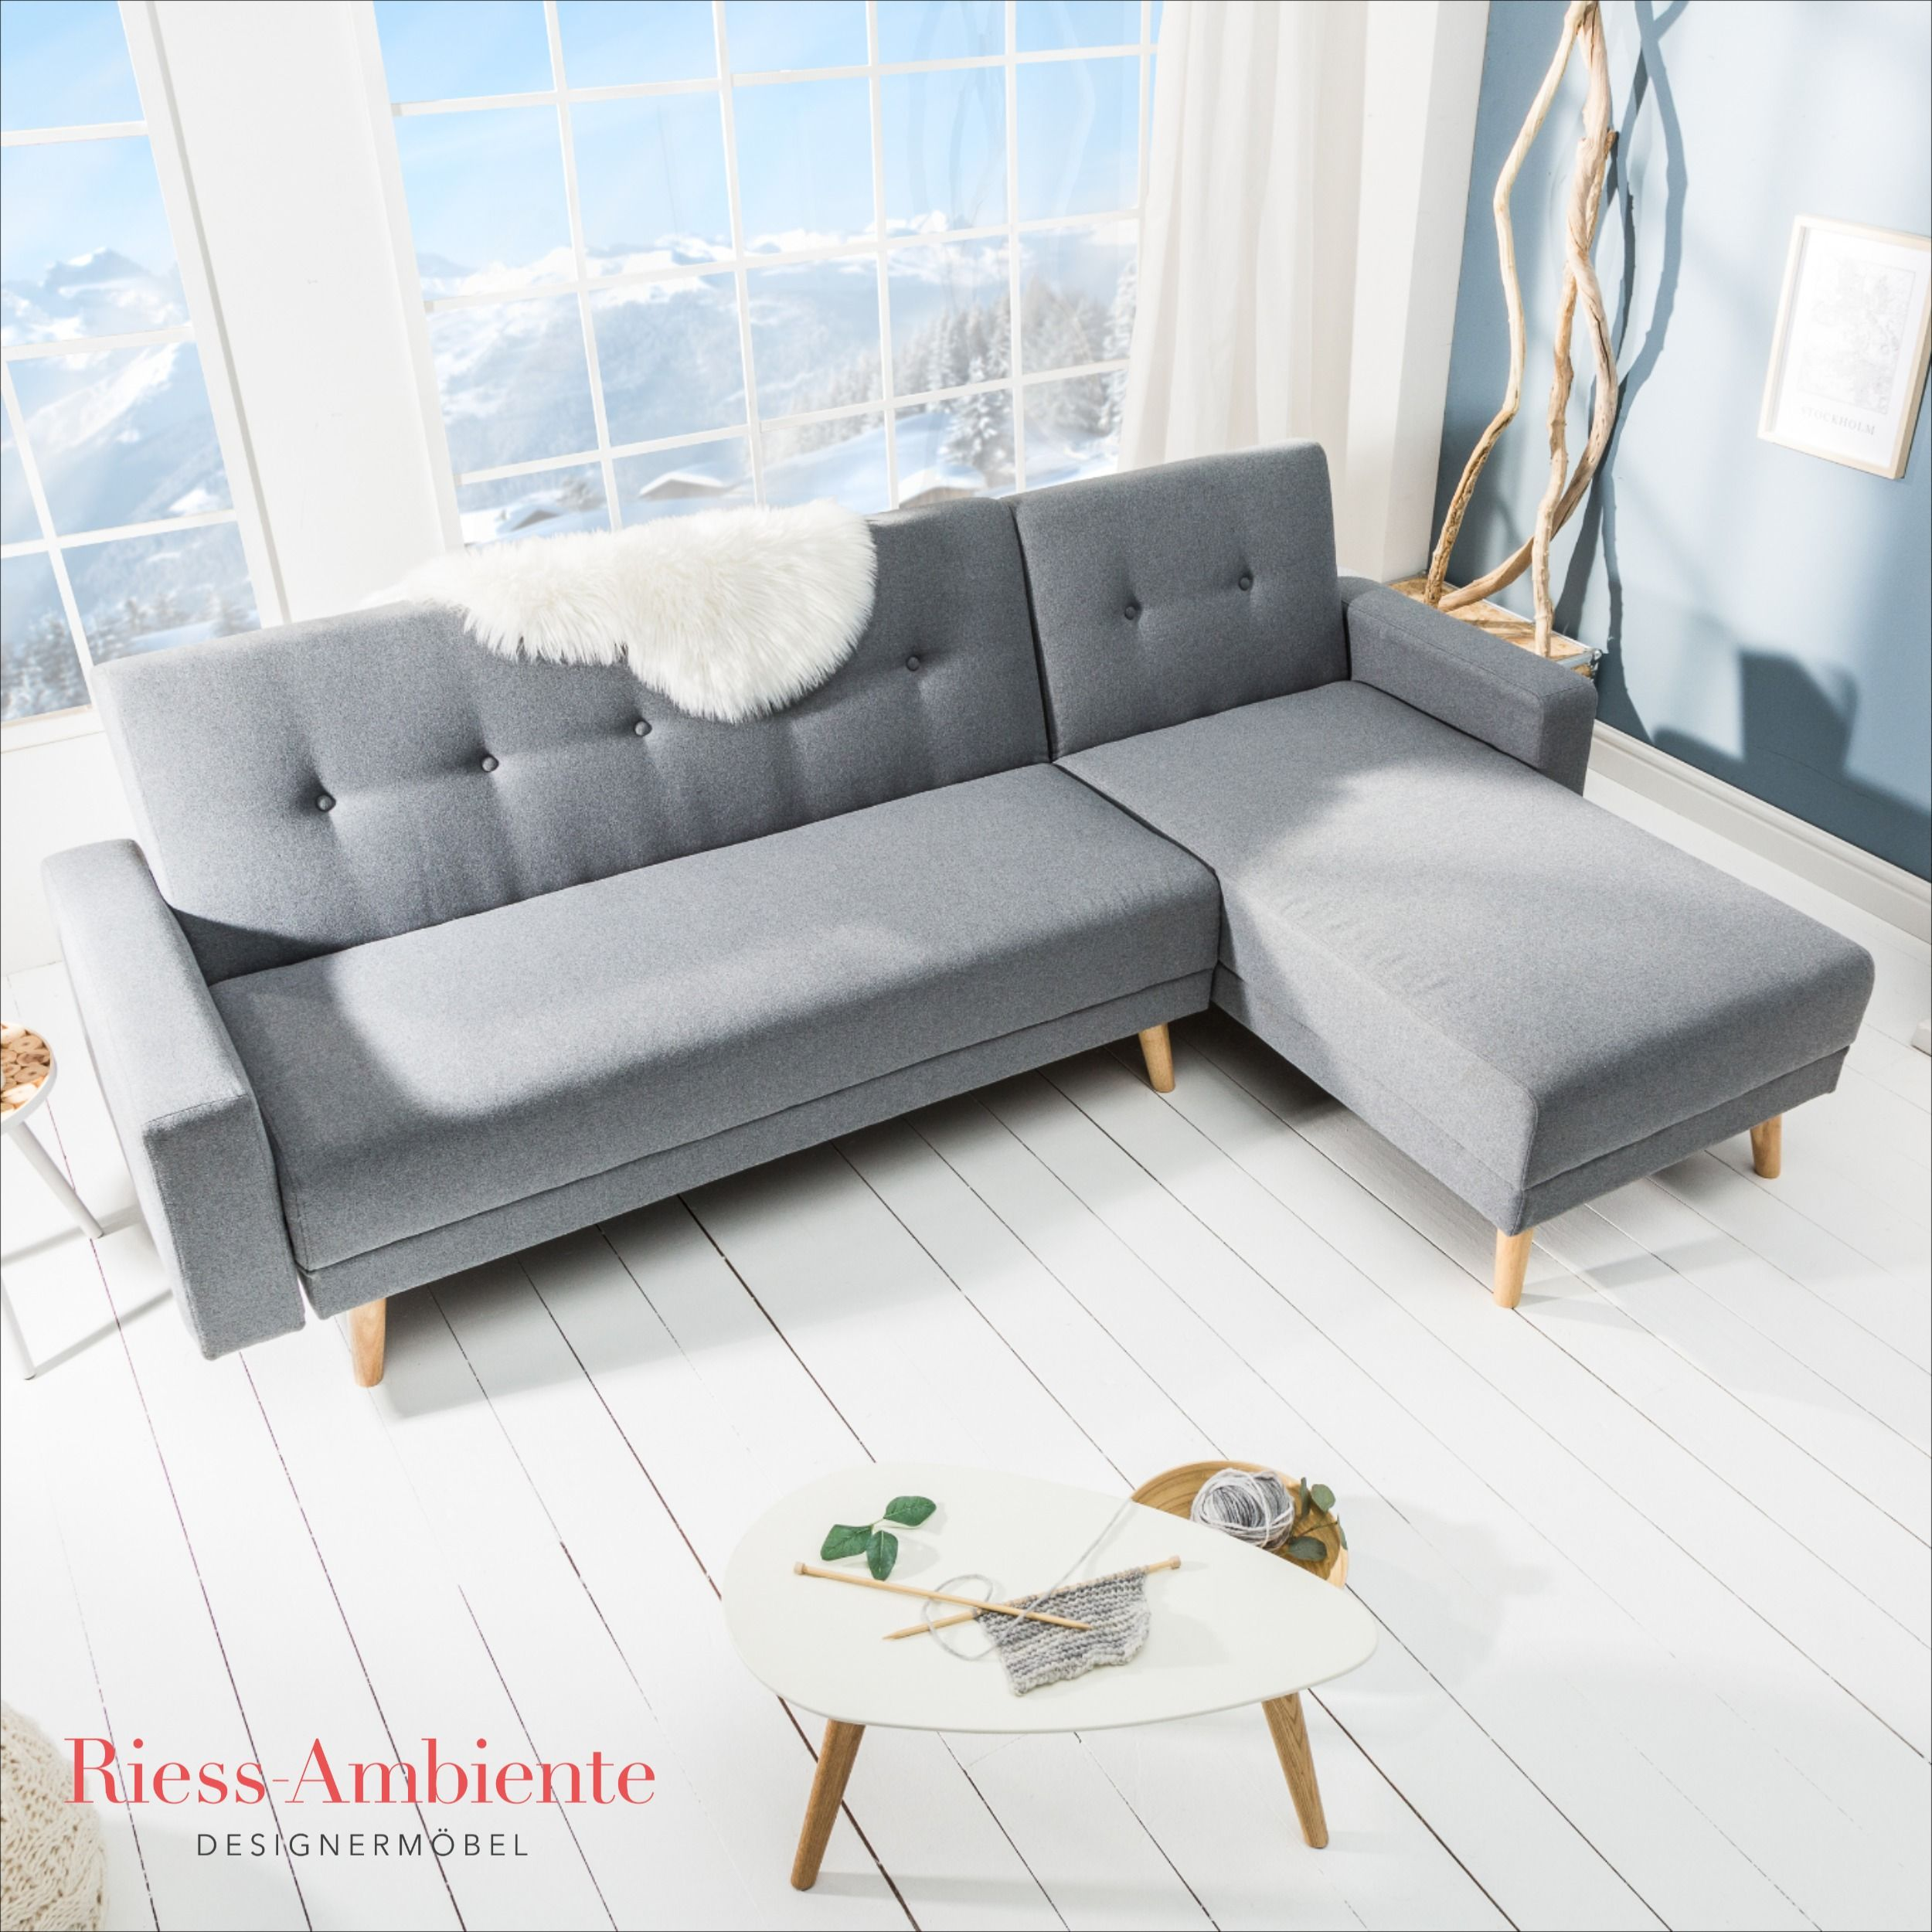 Elegantes 3er Sofa Petit Beaute 180cm Grau Samt Schlafsofa In 2020 Samt Sofa Schlafsofa Sofa